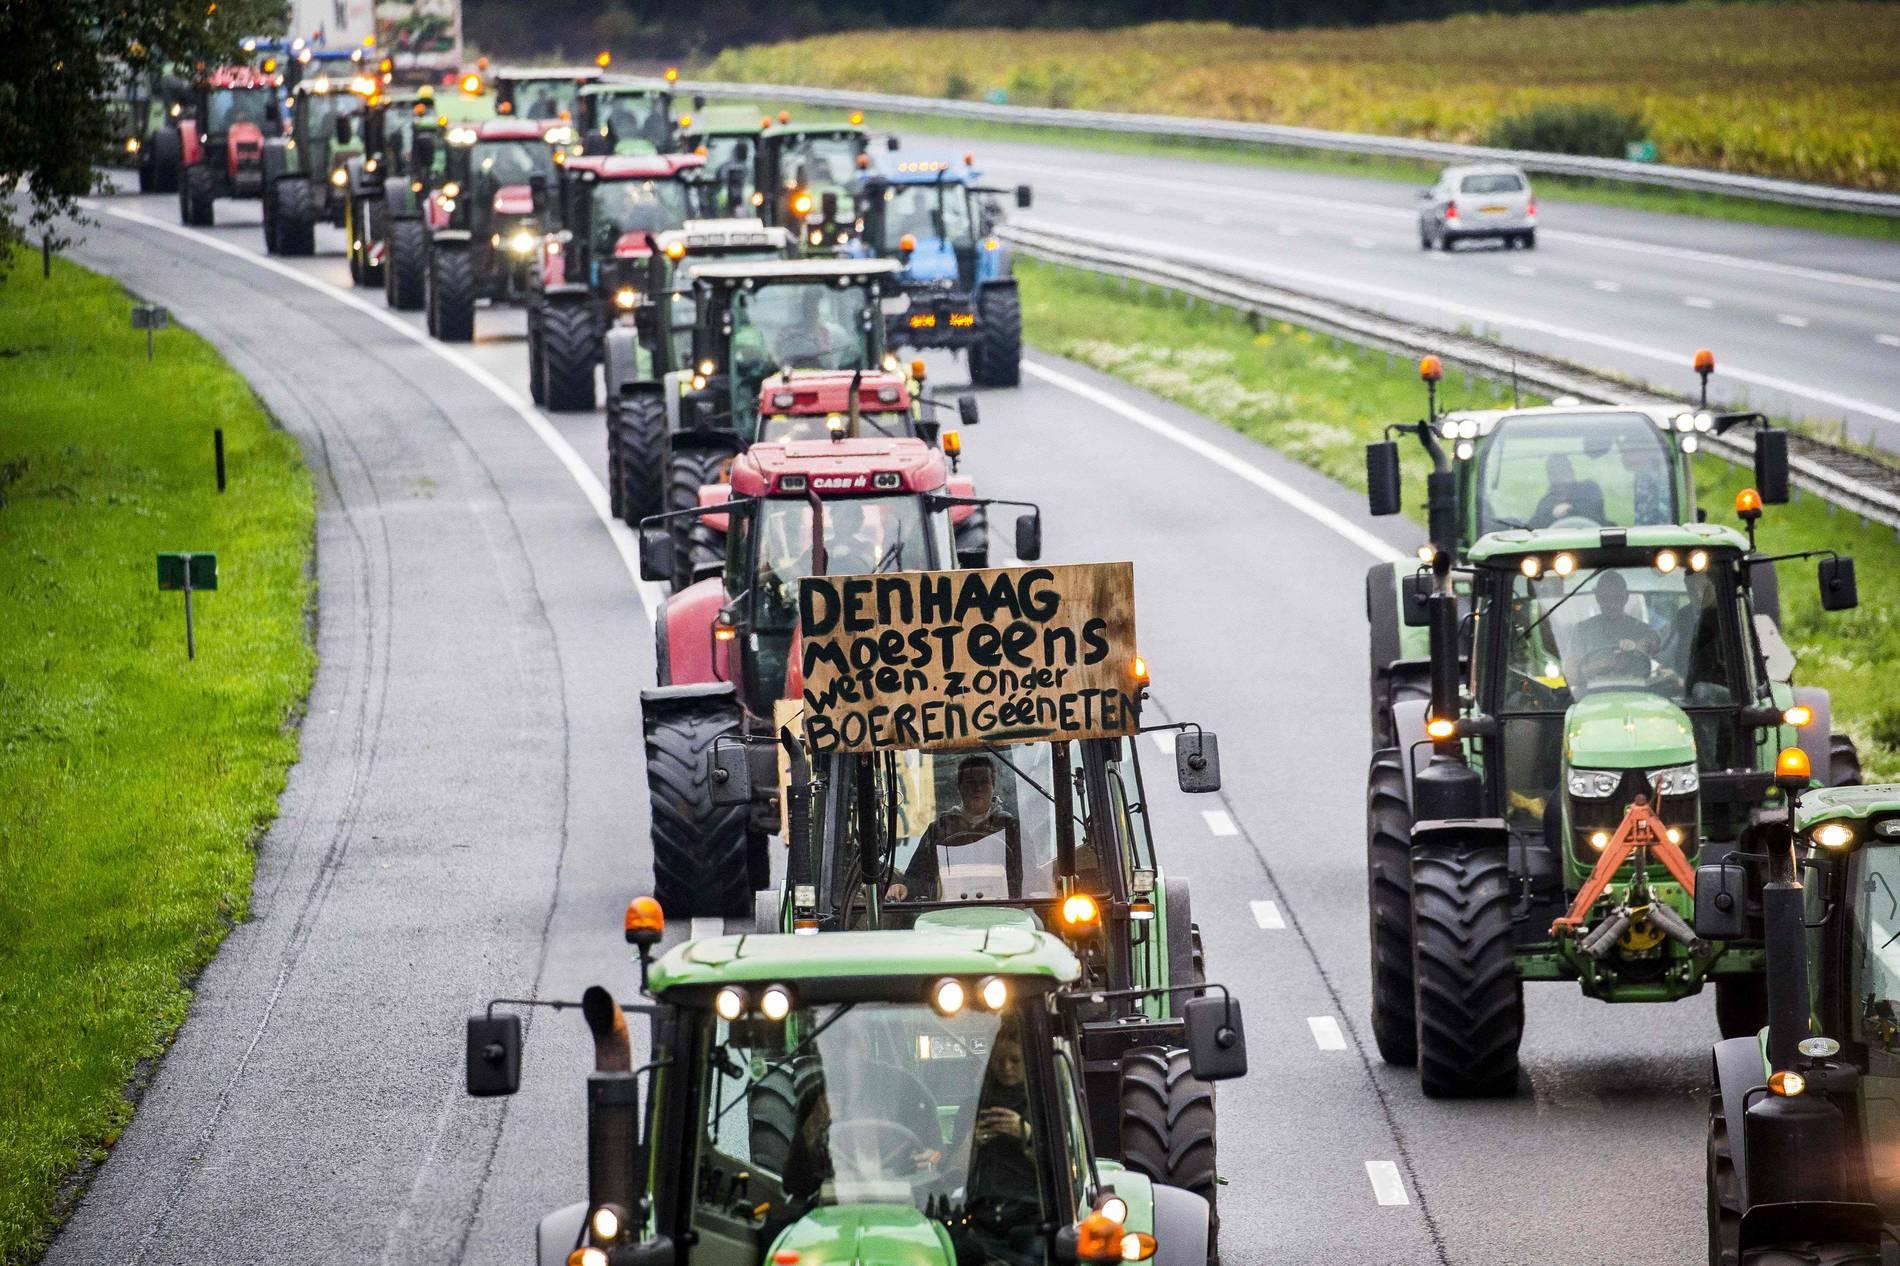 Verkehrschaos: Niederländische Bauen legen Den Haag lahm - News - Panorama